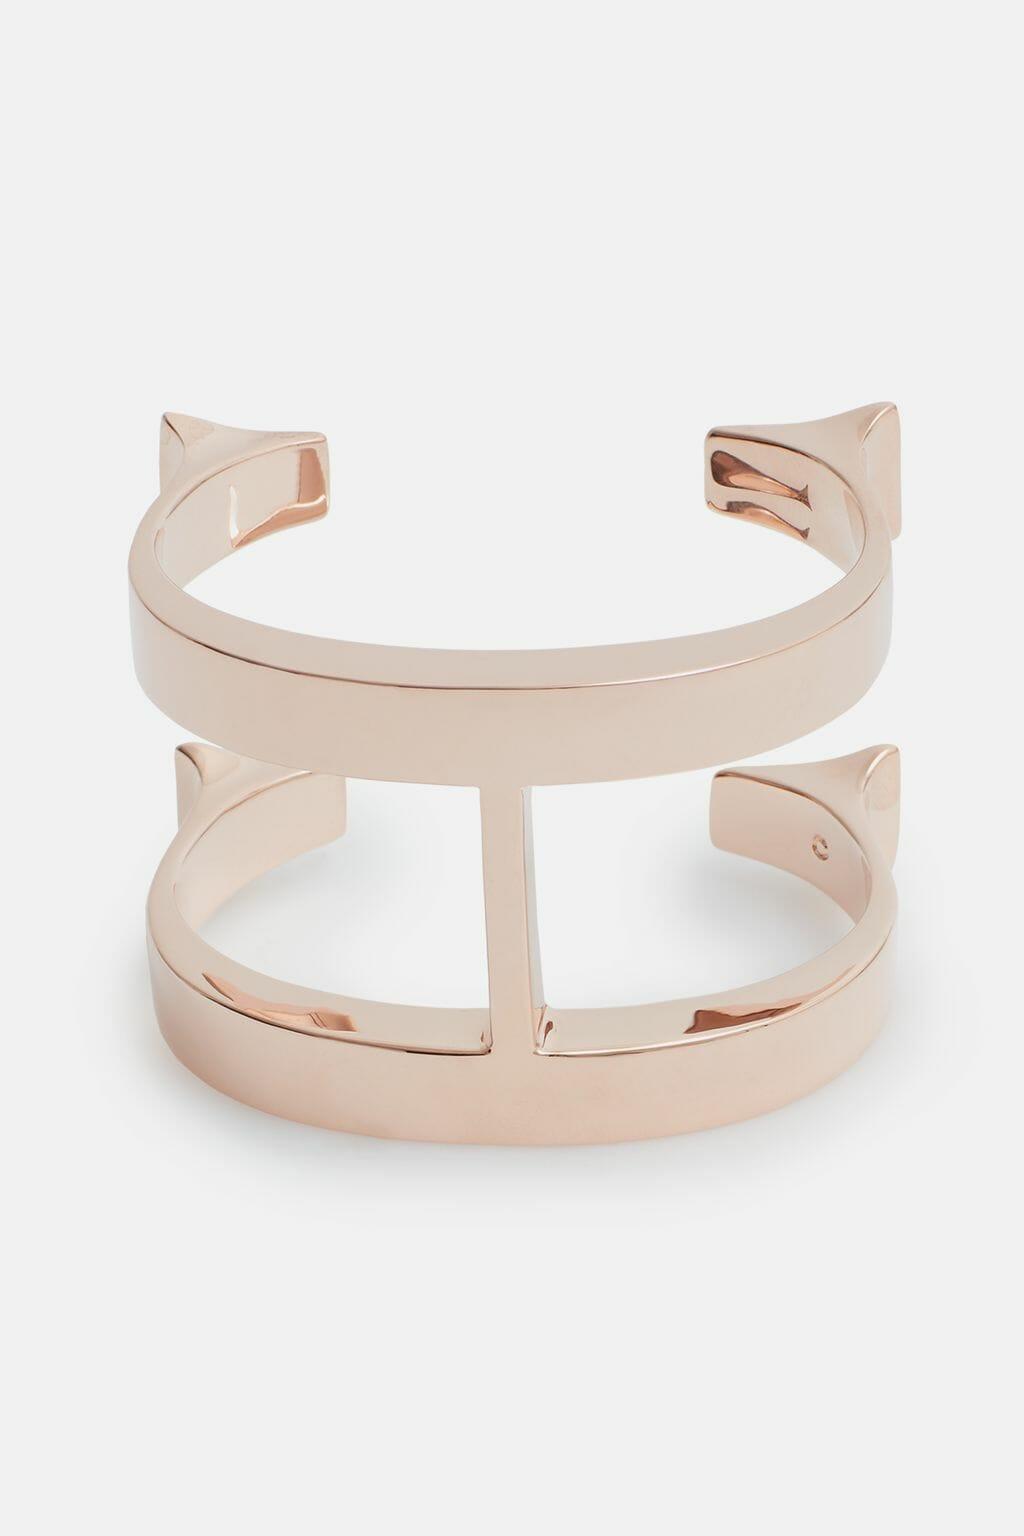 CH-Carolina-herrera-insignia-jewelry-look-6